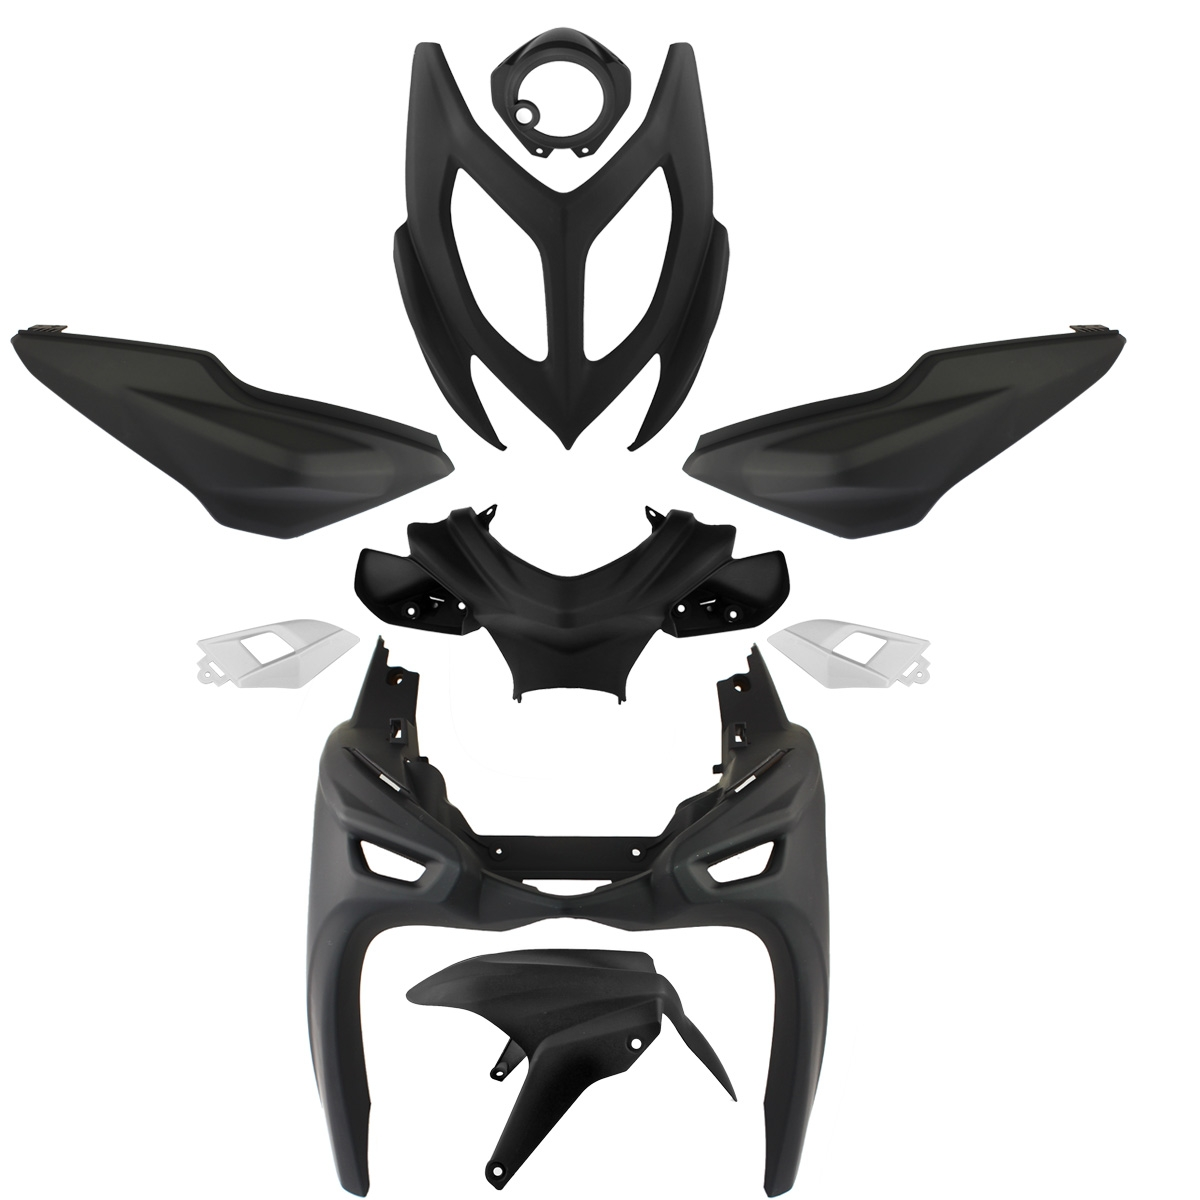 Kit carrosserie Aerox / Nitro 2013 9 pièces noir mat